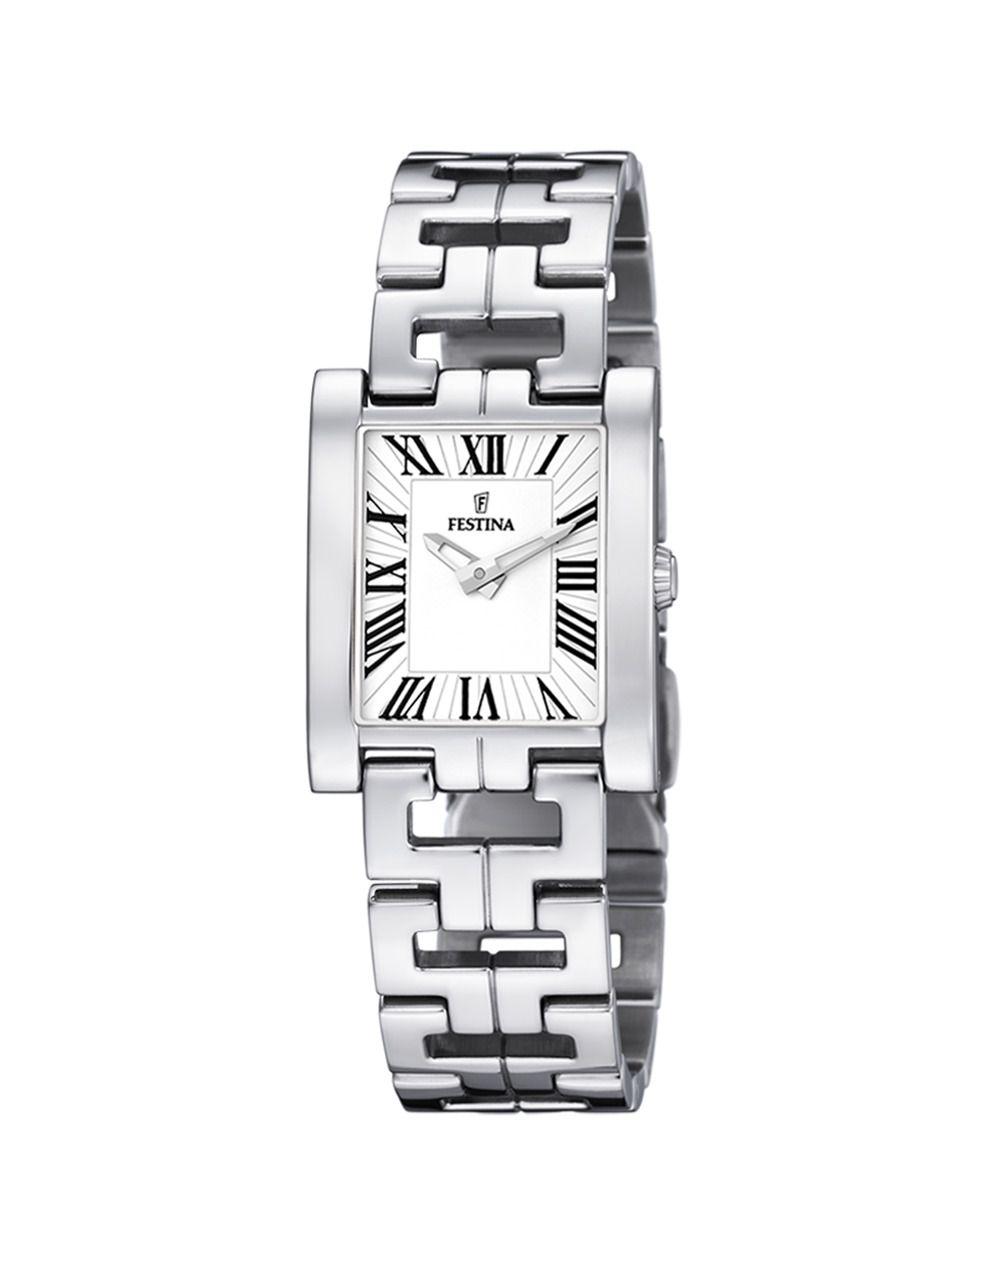 1c6a49995f44 Reloj de mujer Festina - 79 €